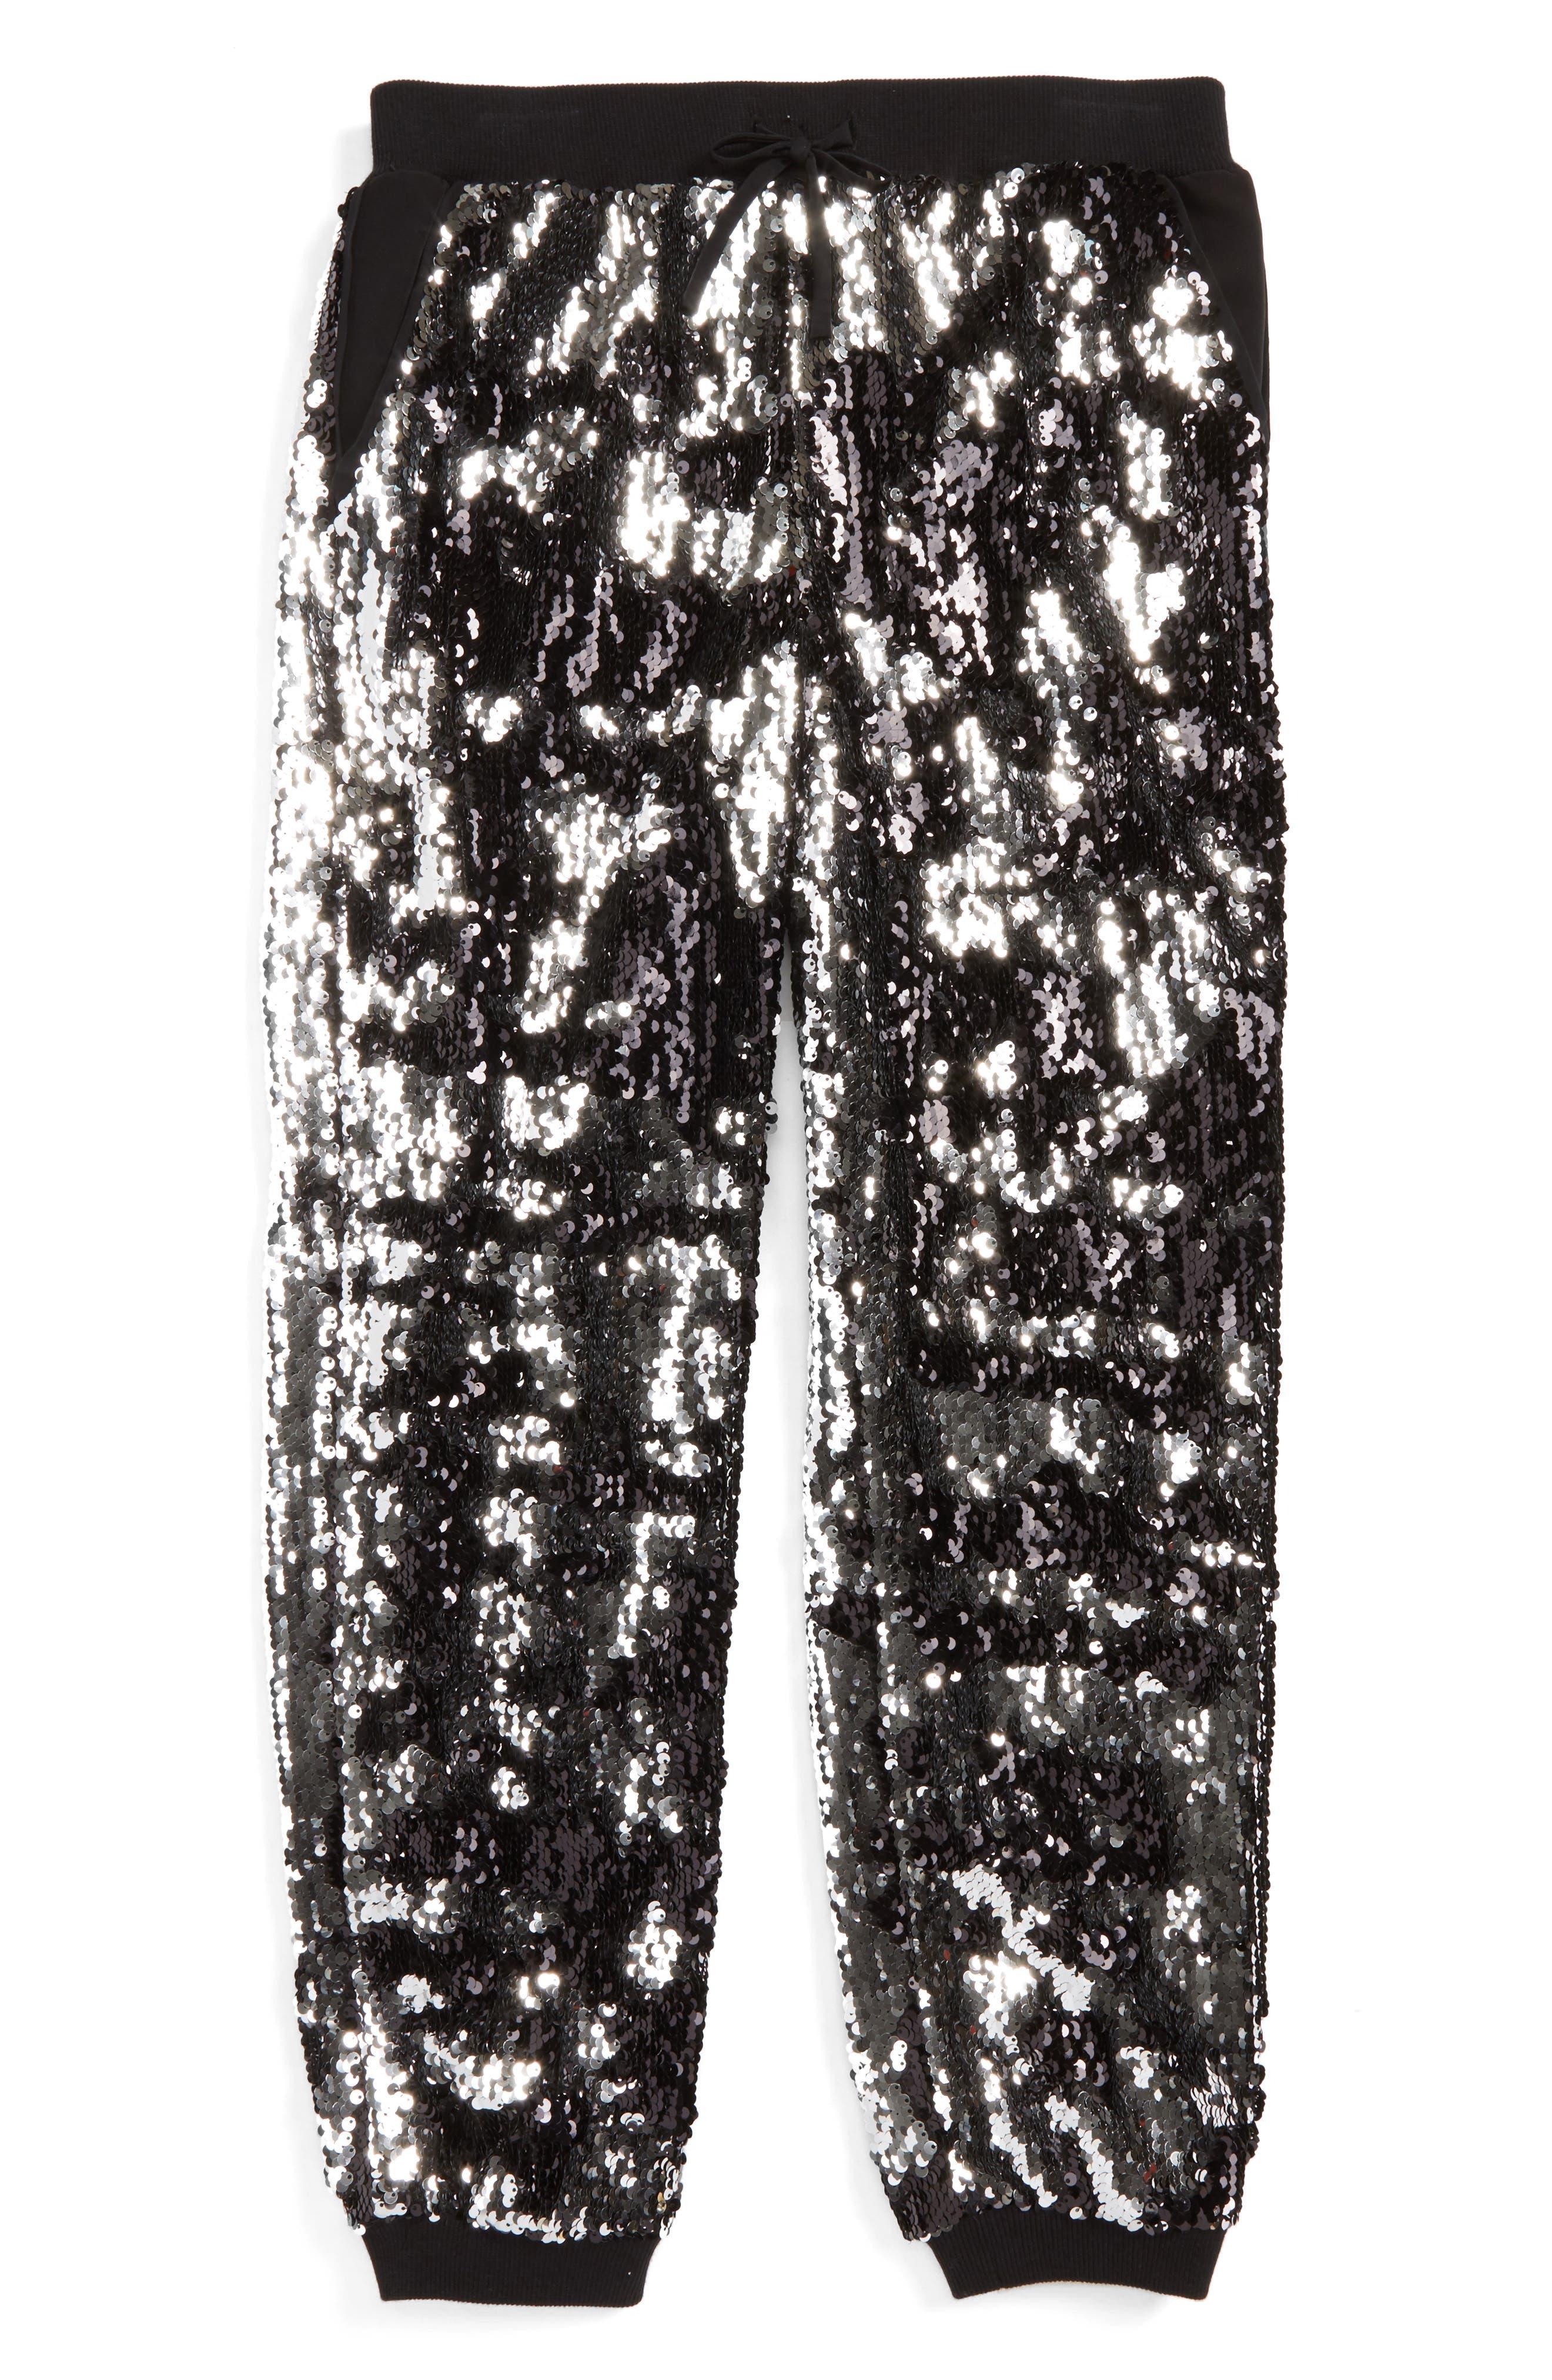 Sequin Jogger Pants,                             Main thumbnail 1, color,                             003